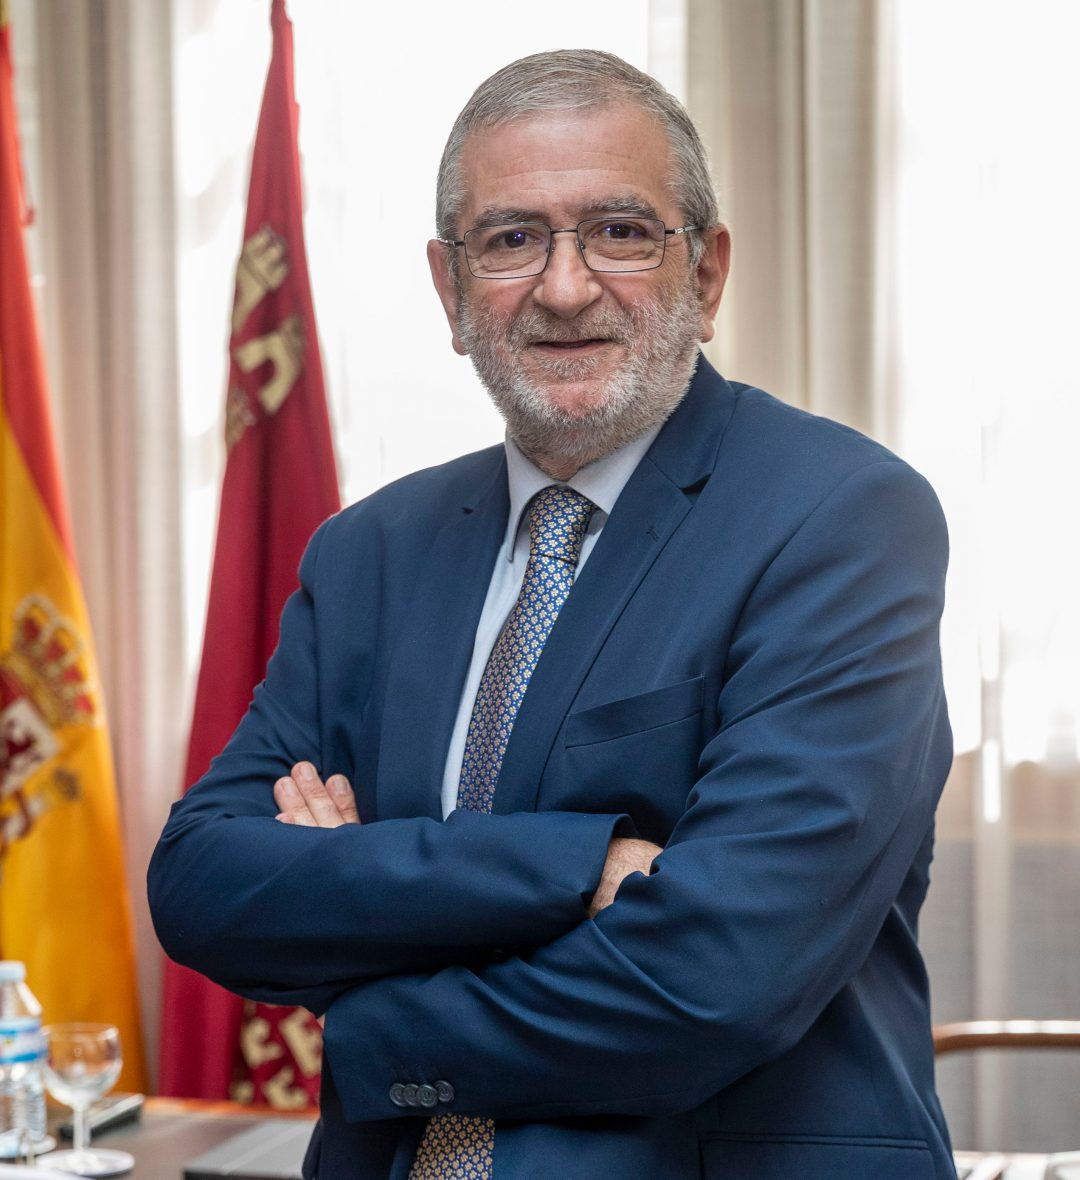 Alberto Castillo Baños (Asamblea Regional de Murcia)